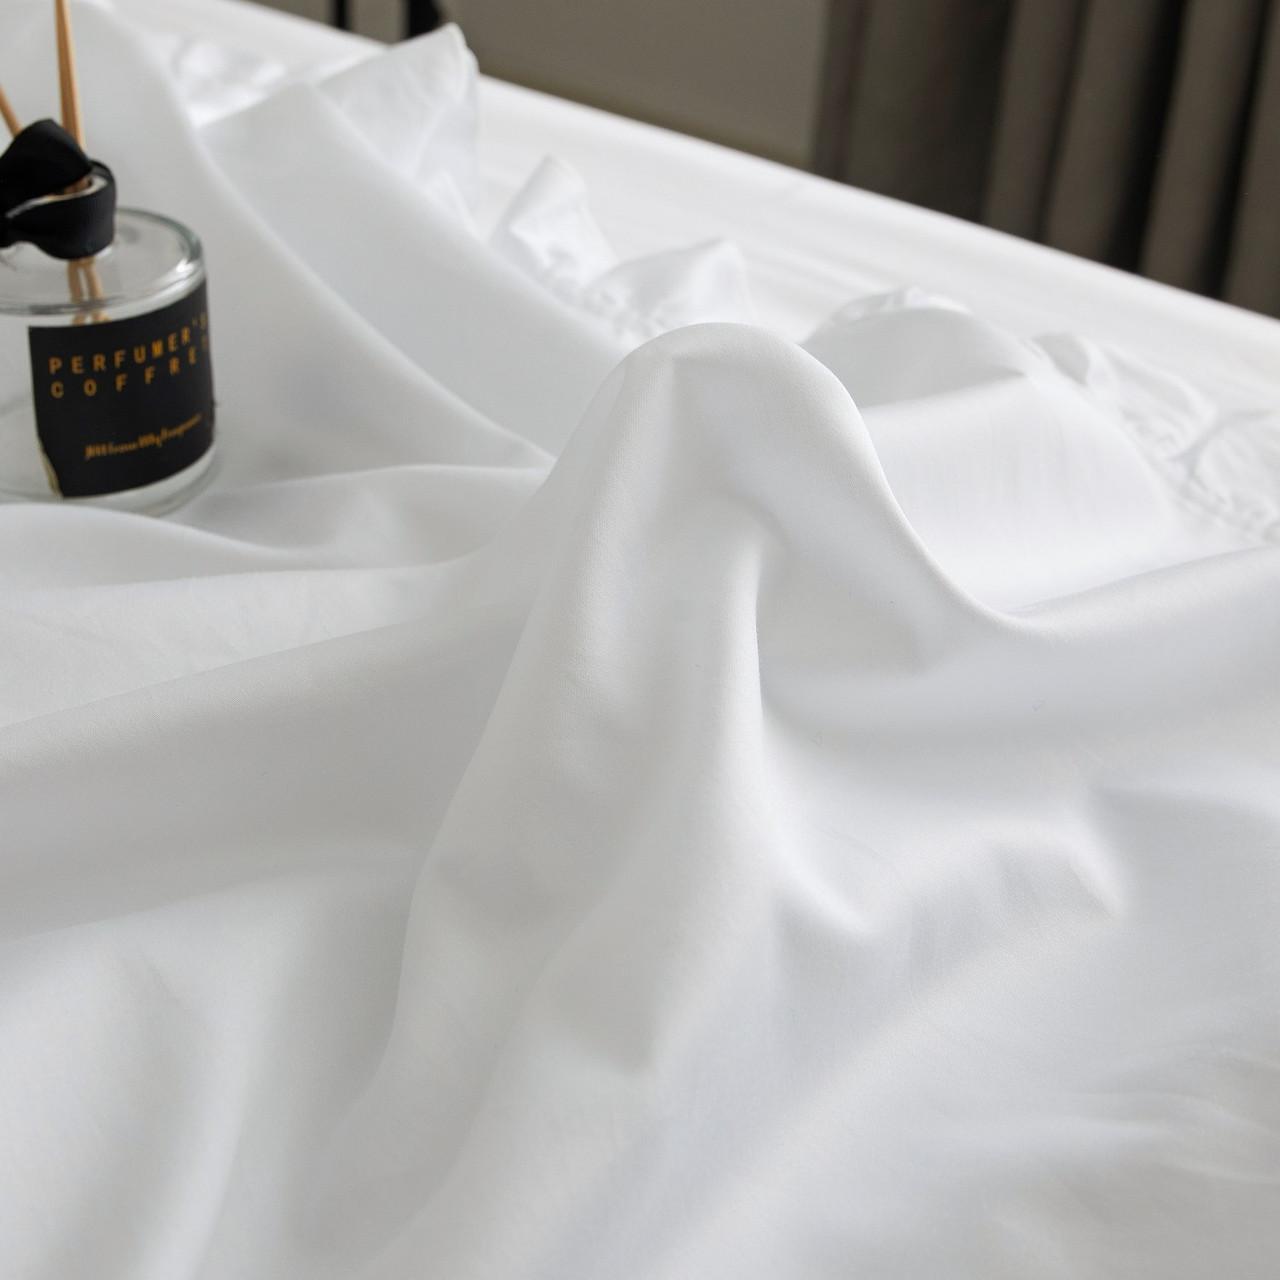 DM807T Ruffle Edge Bedding - Snow White: 4 Pieces Luxury Twin Size Duvet Cover Set 100% Cotton